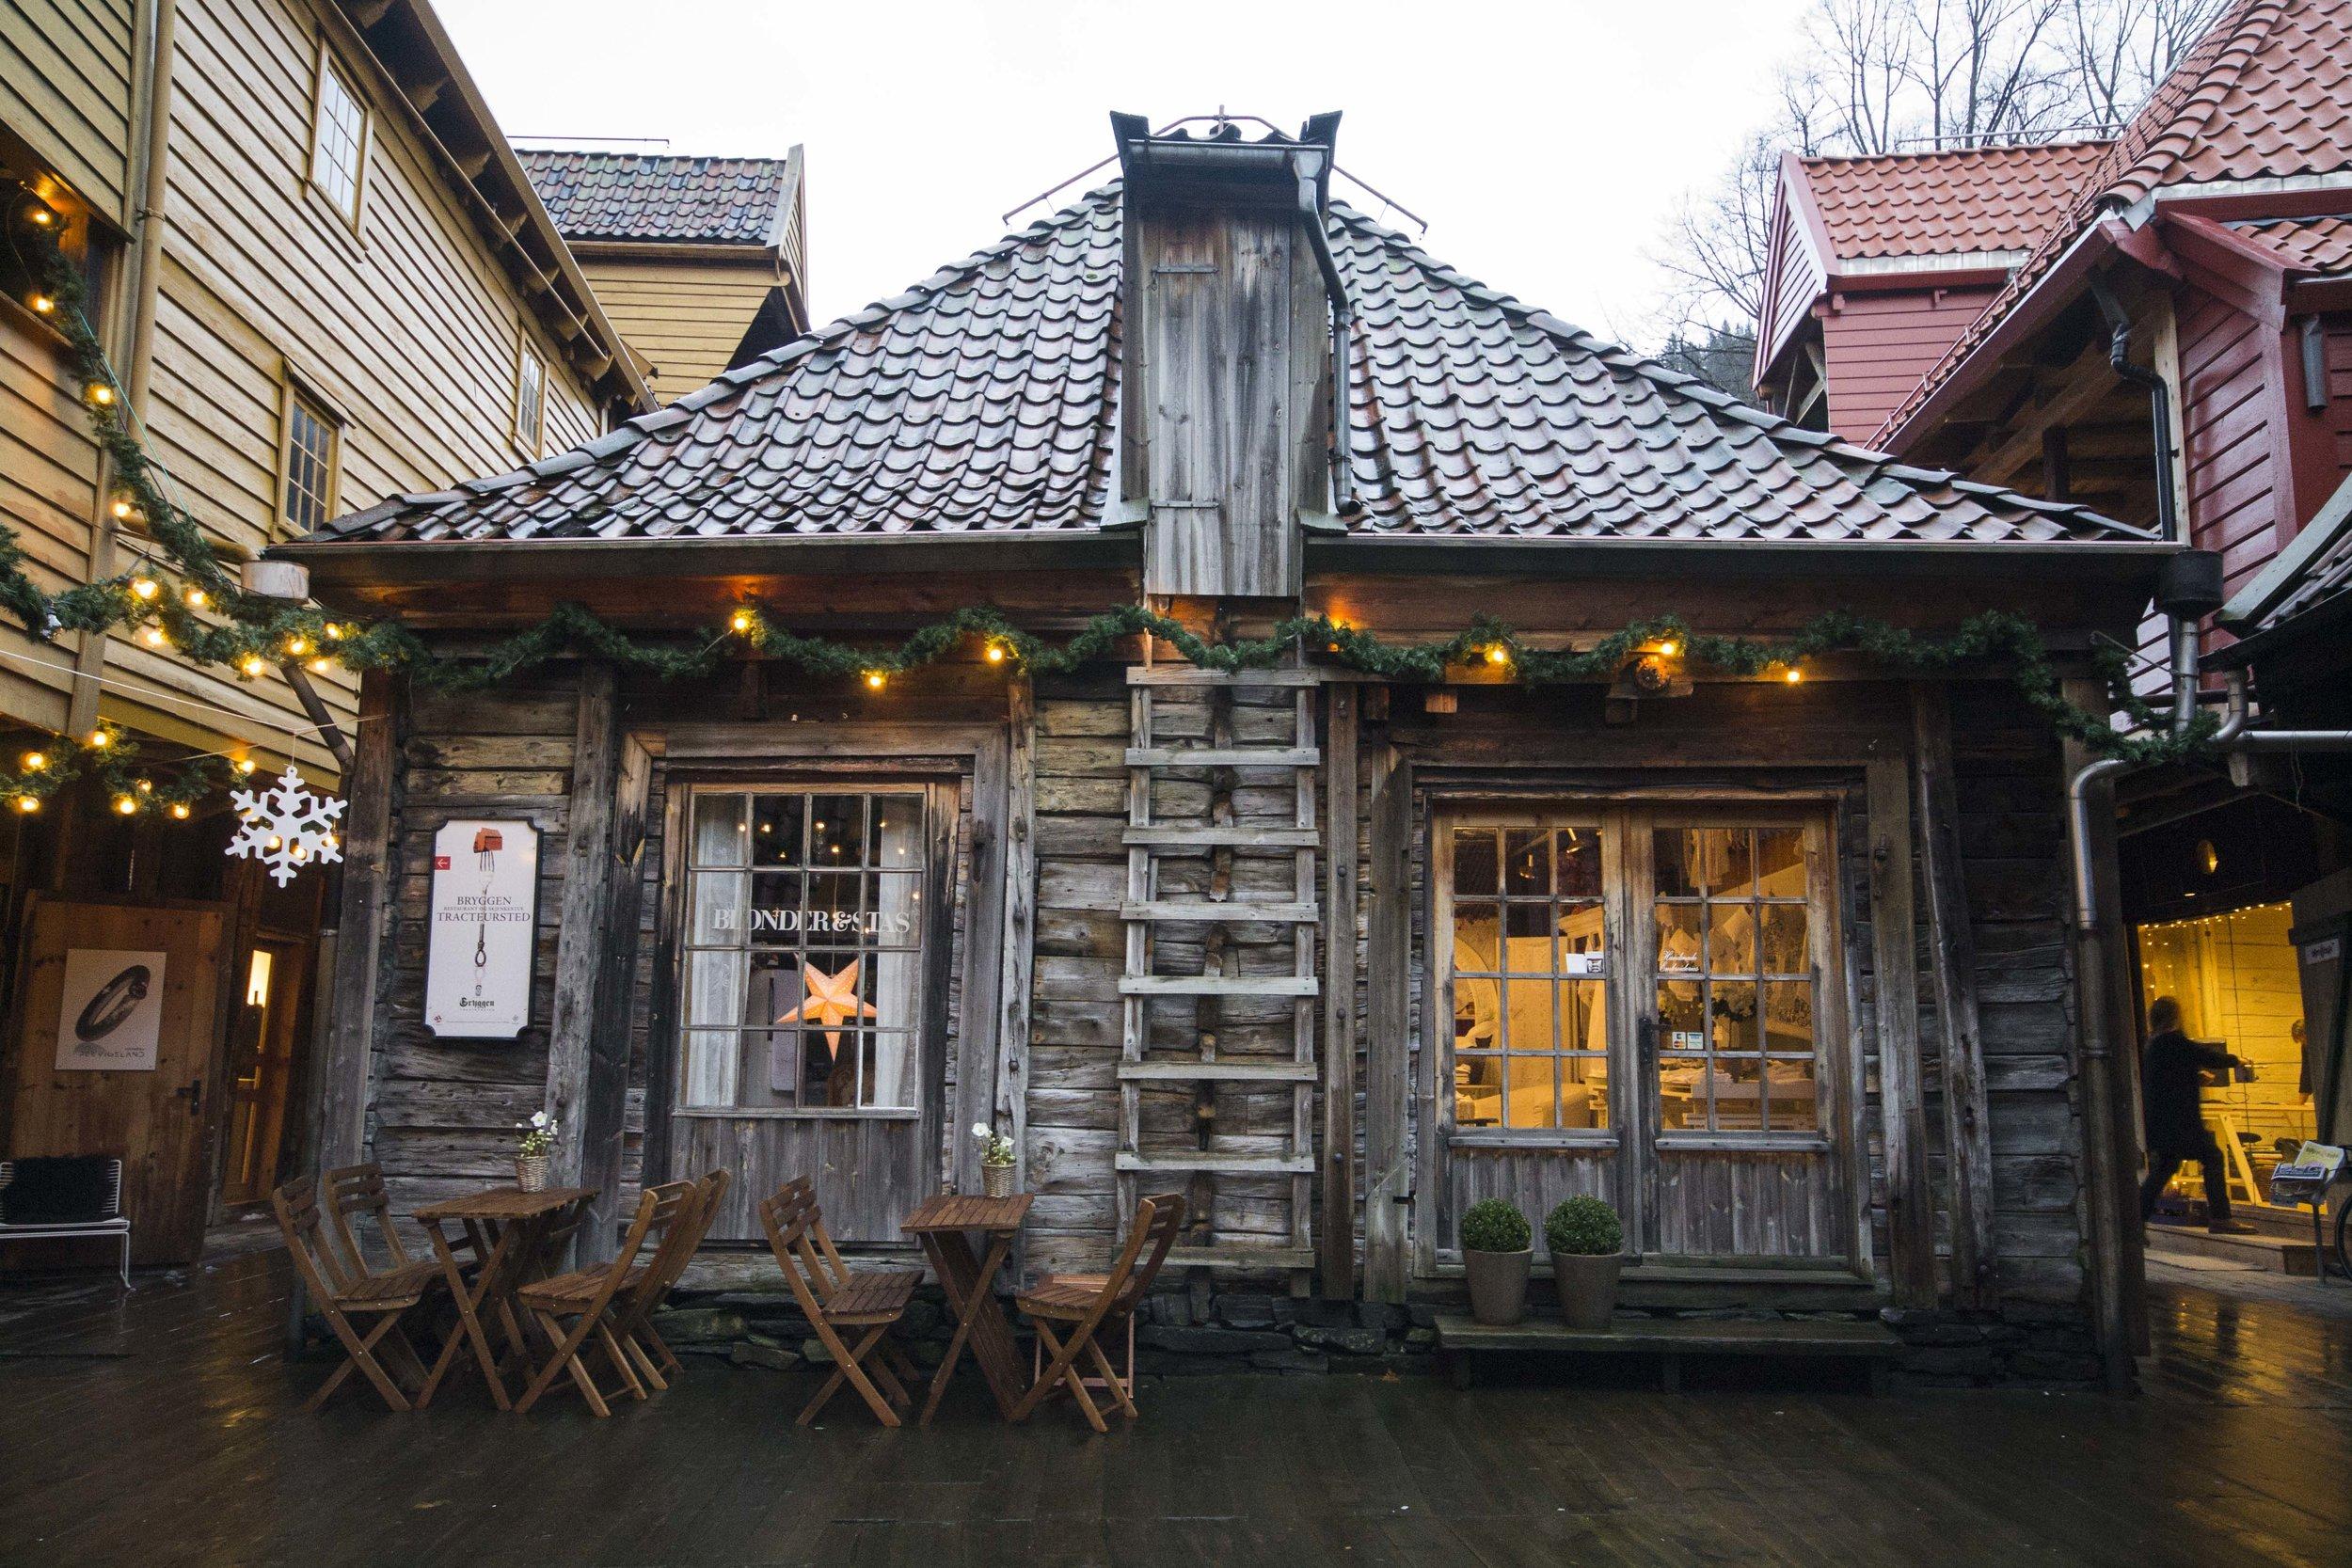 Bergen_151203_0071.JPG